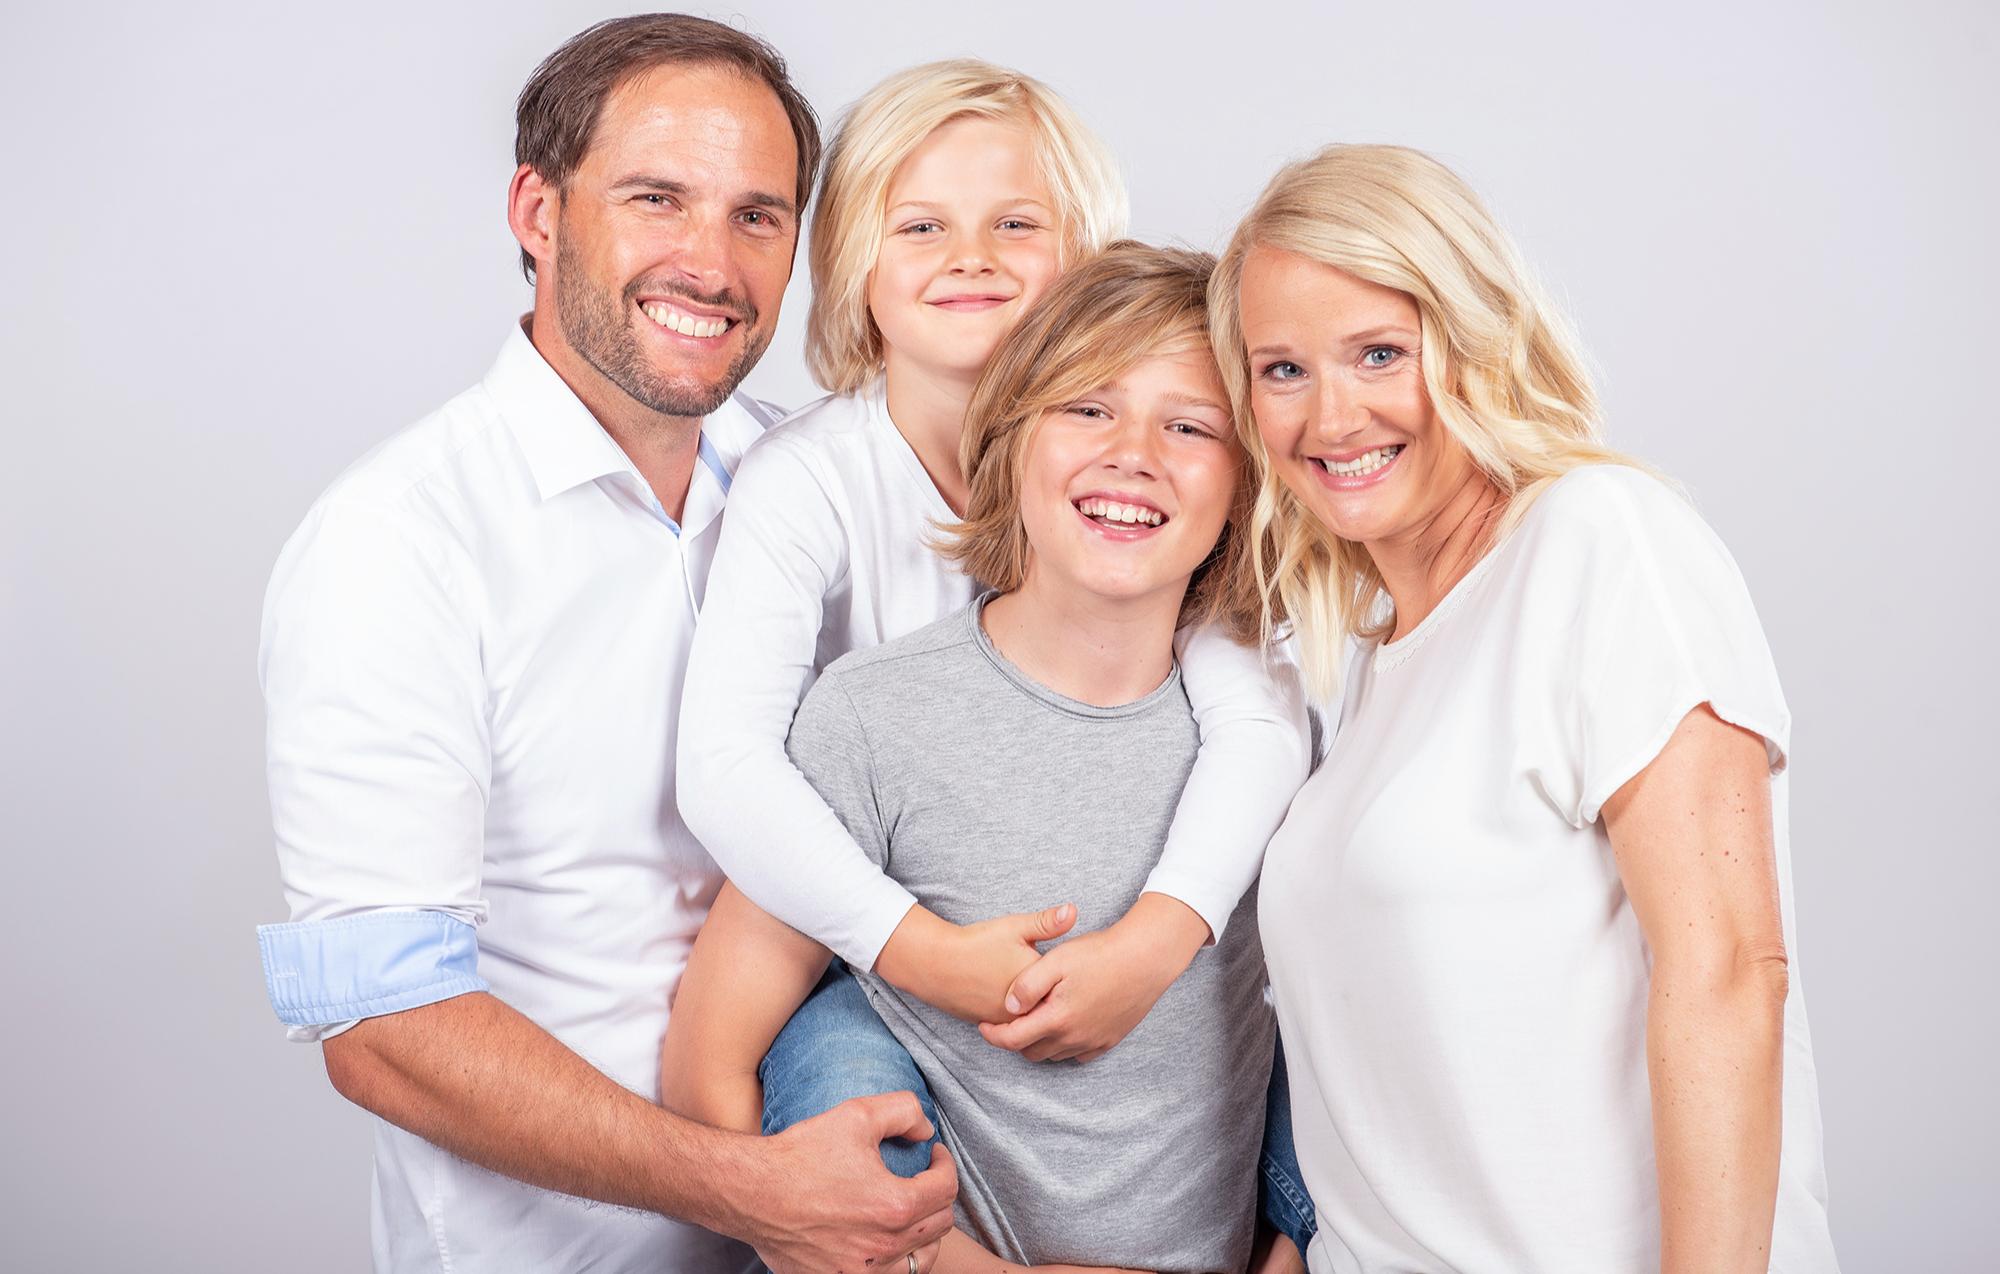 familien-fotoshooting-erfurt-bg11613382197